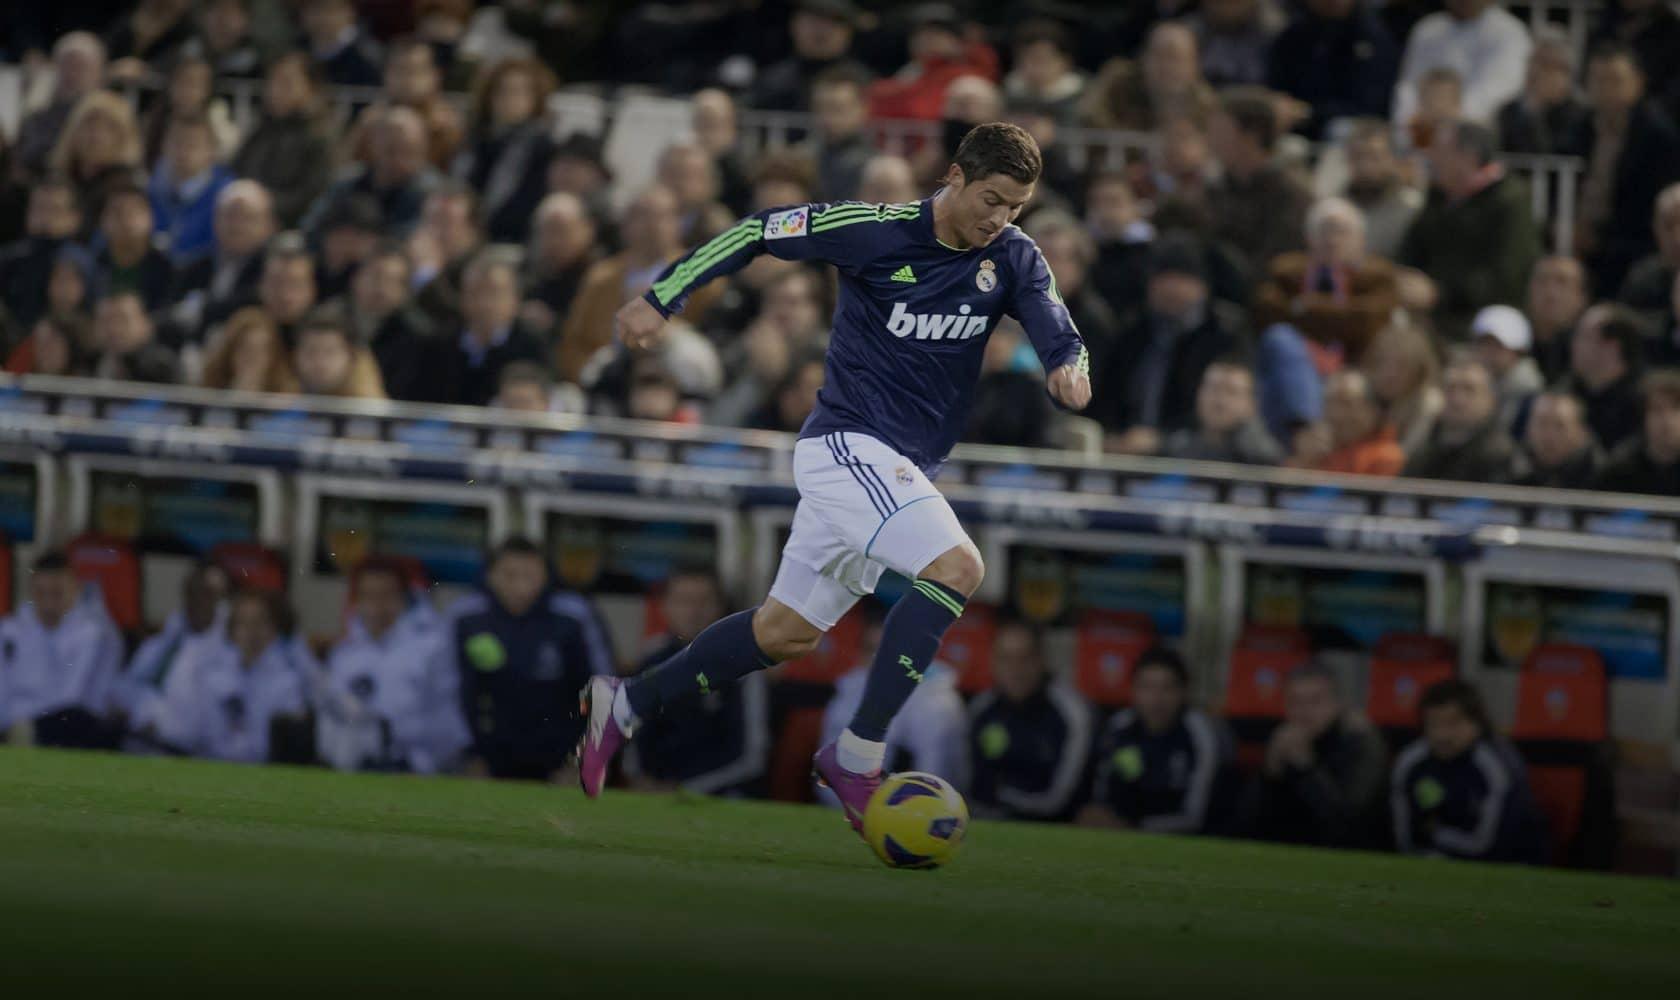 Ronaldo for Real Madrid. Photo: efecreata